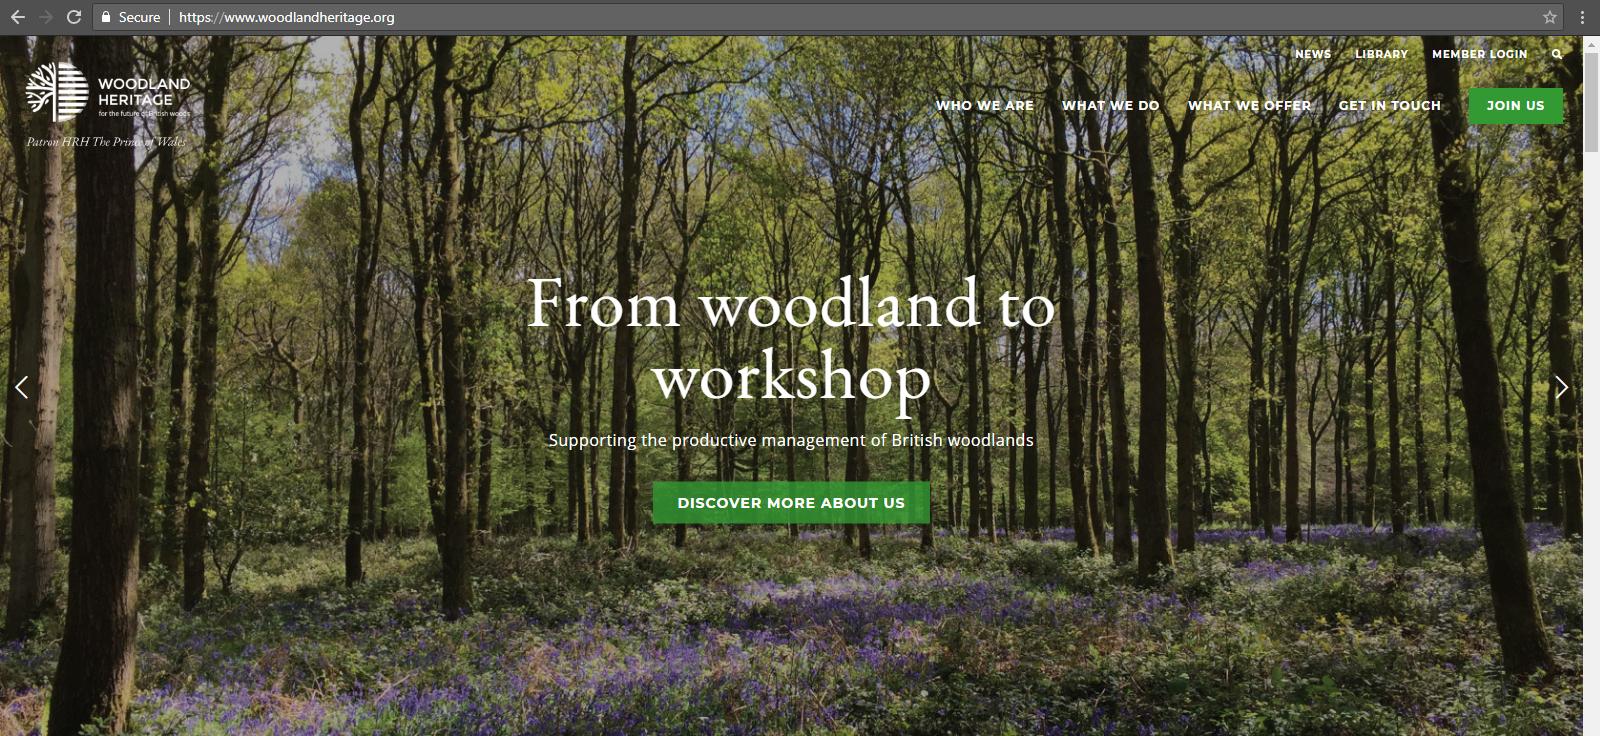 woodland-heritage-website-screenshot.jpg